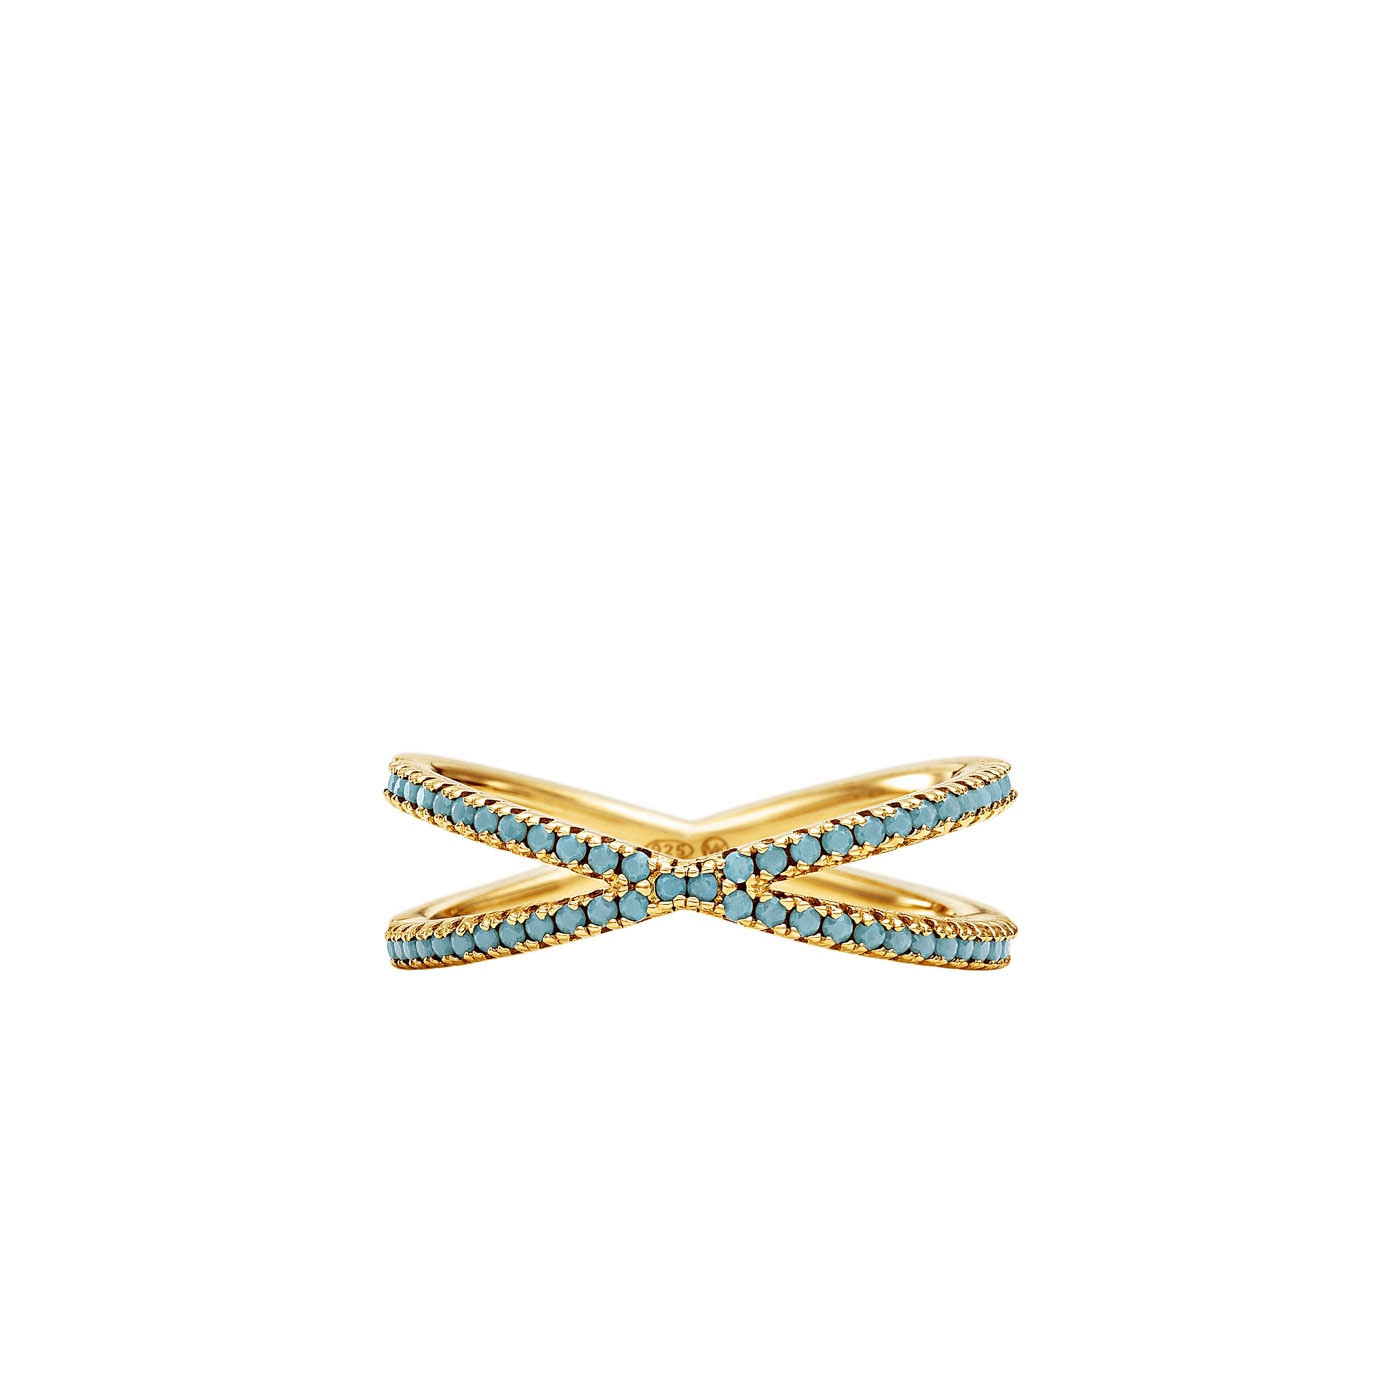 Michael Kors Zilveren Goudkleurige/Blauwe Custom Ring MKC1112AS710